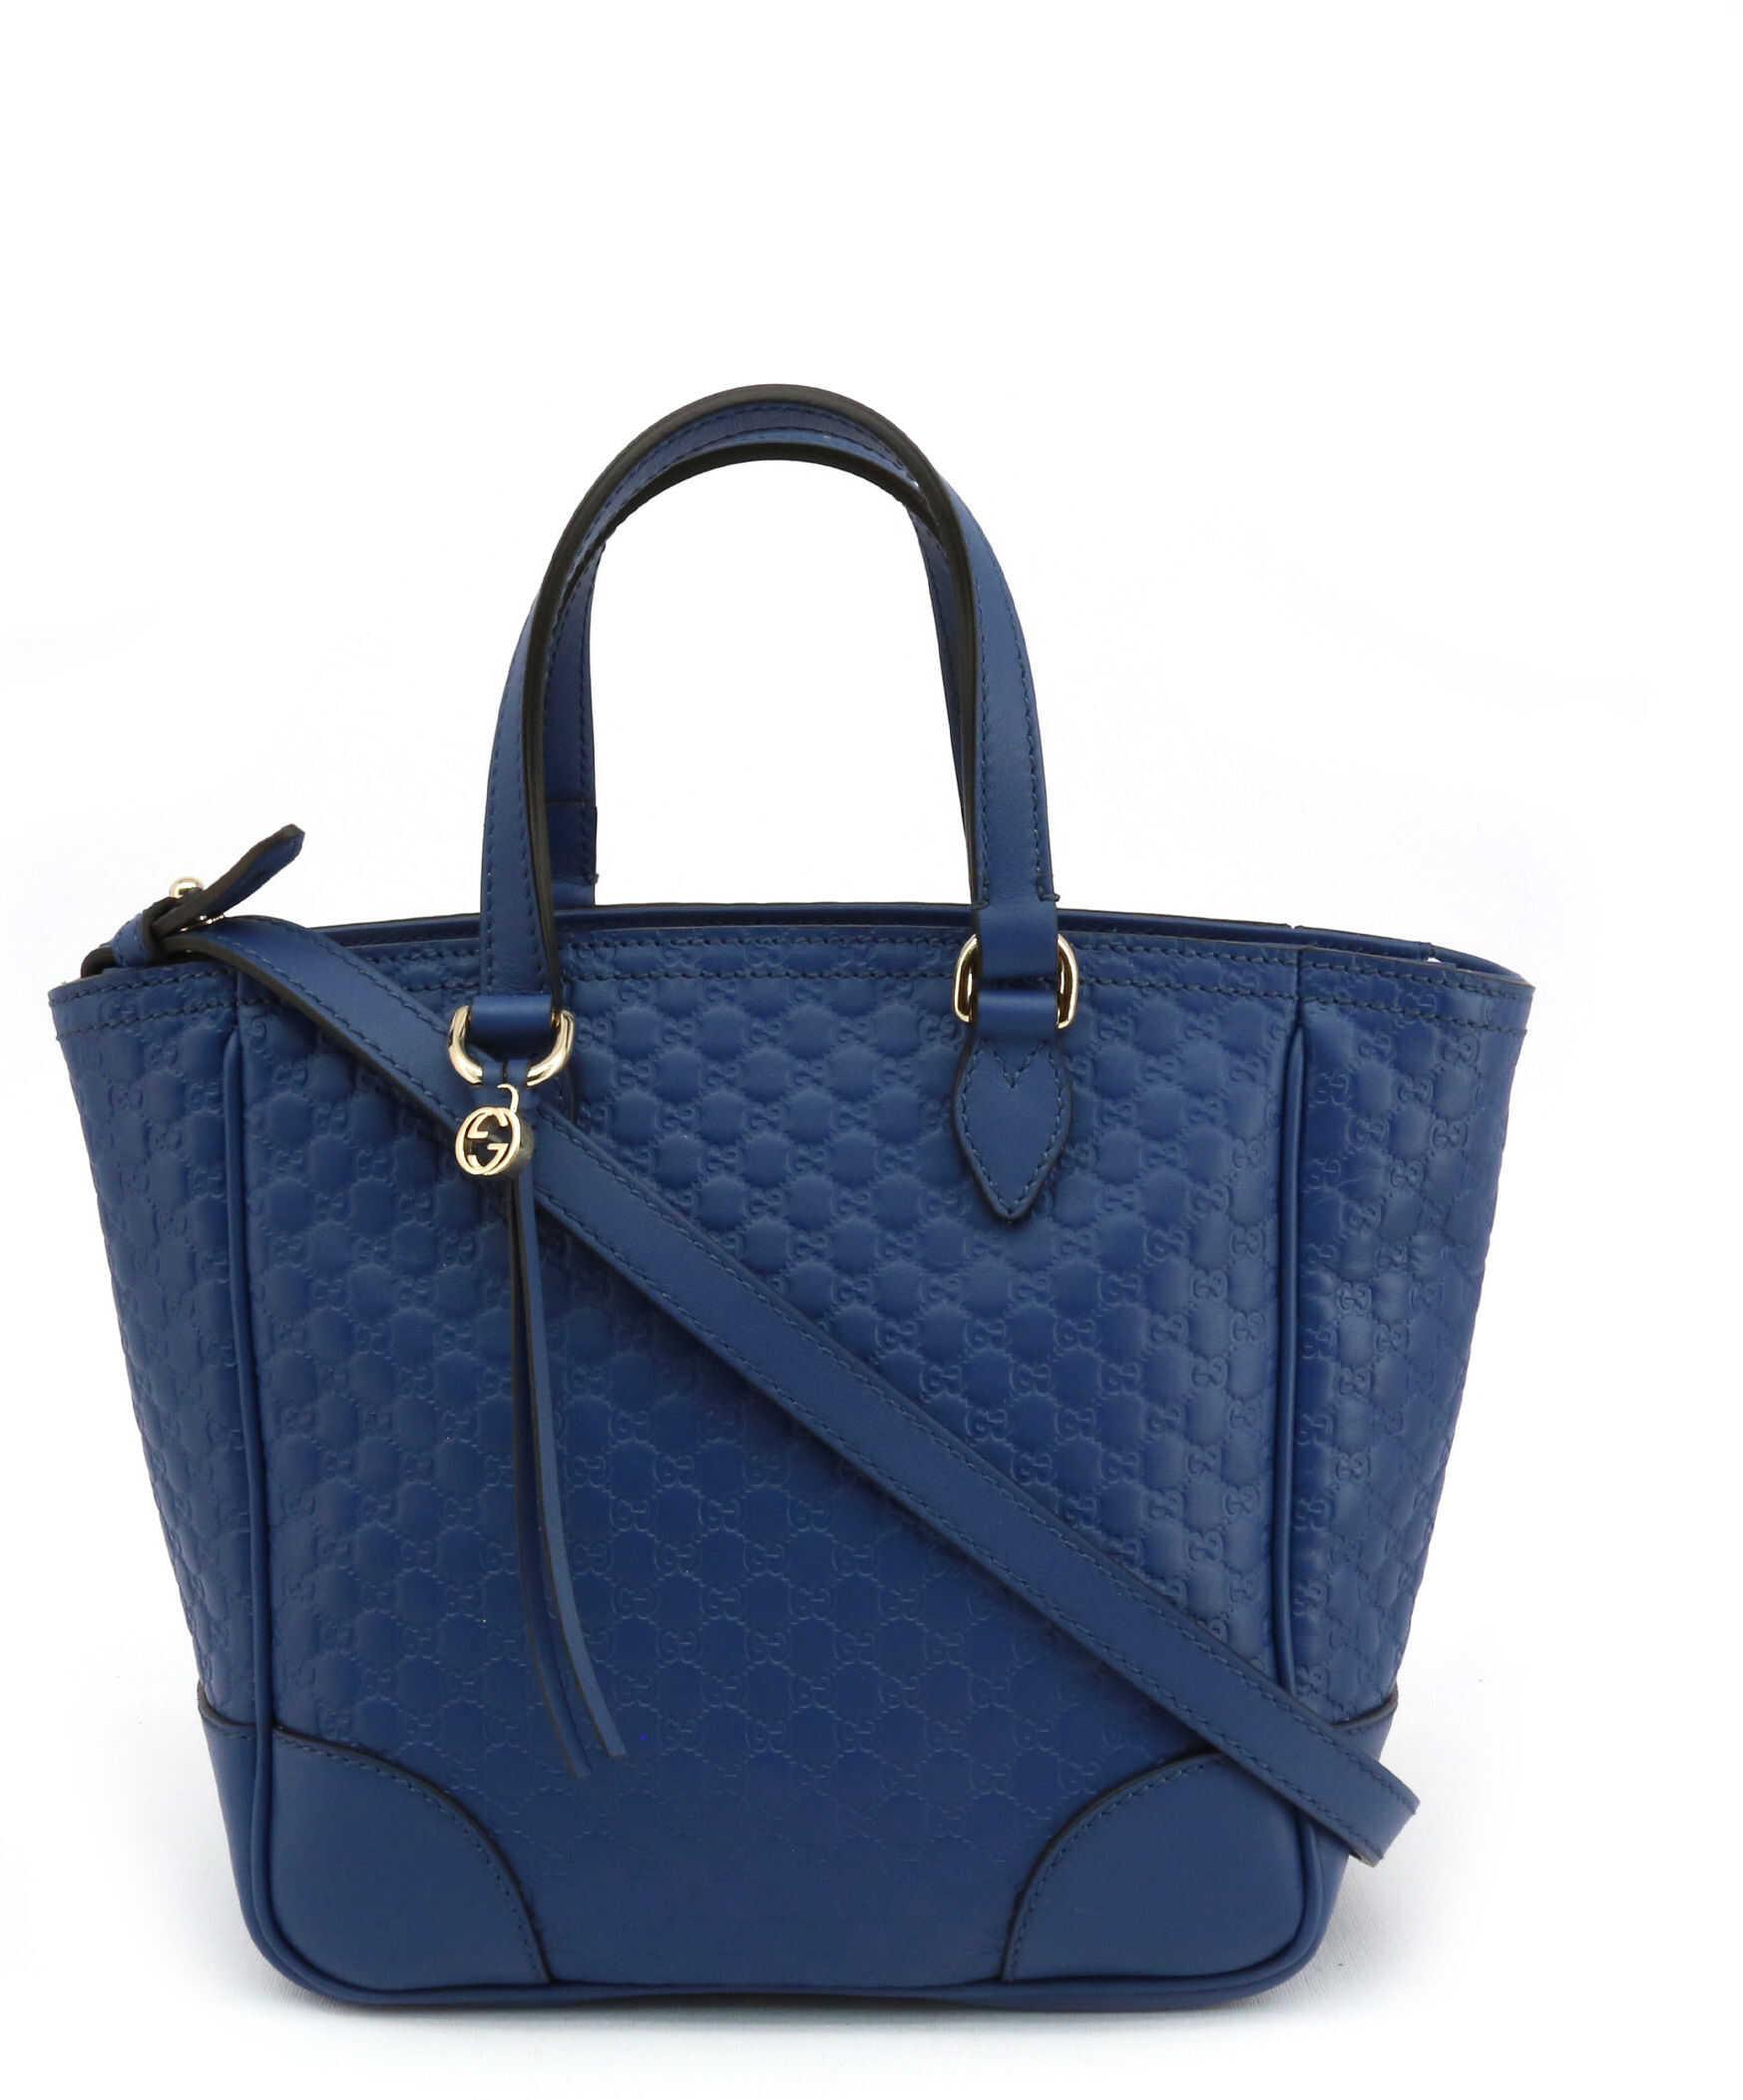 Gucci 449241_Bmj1G BLUE imagine b-mall.ro